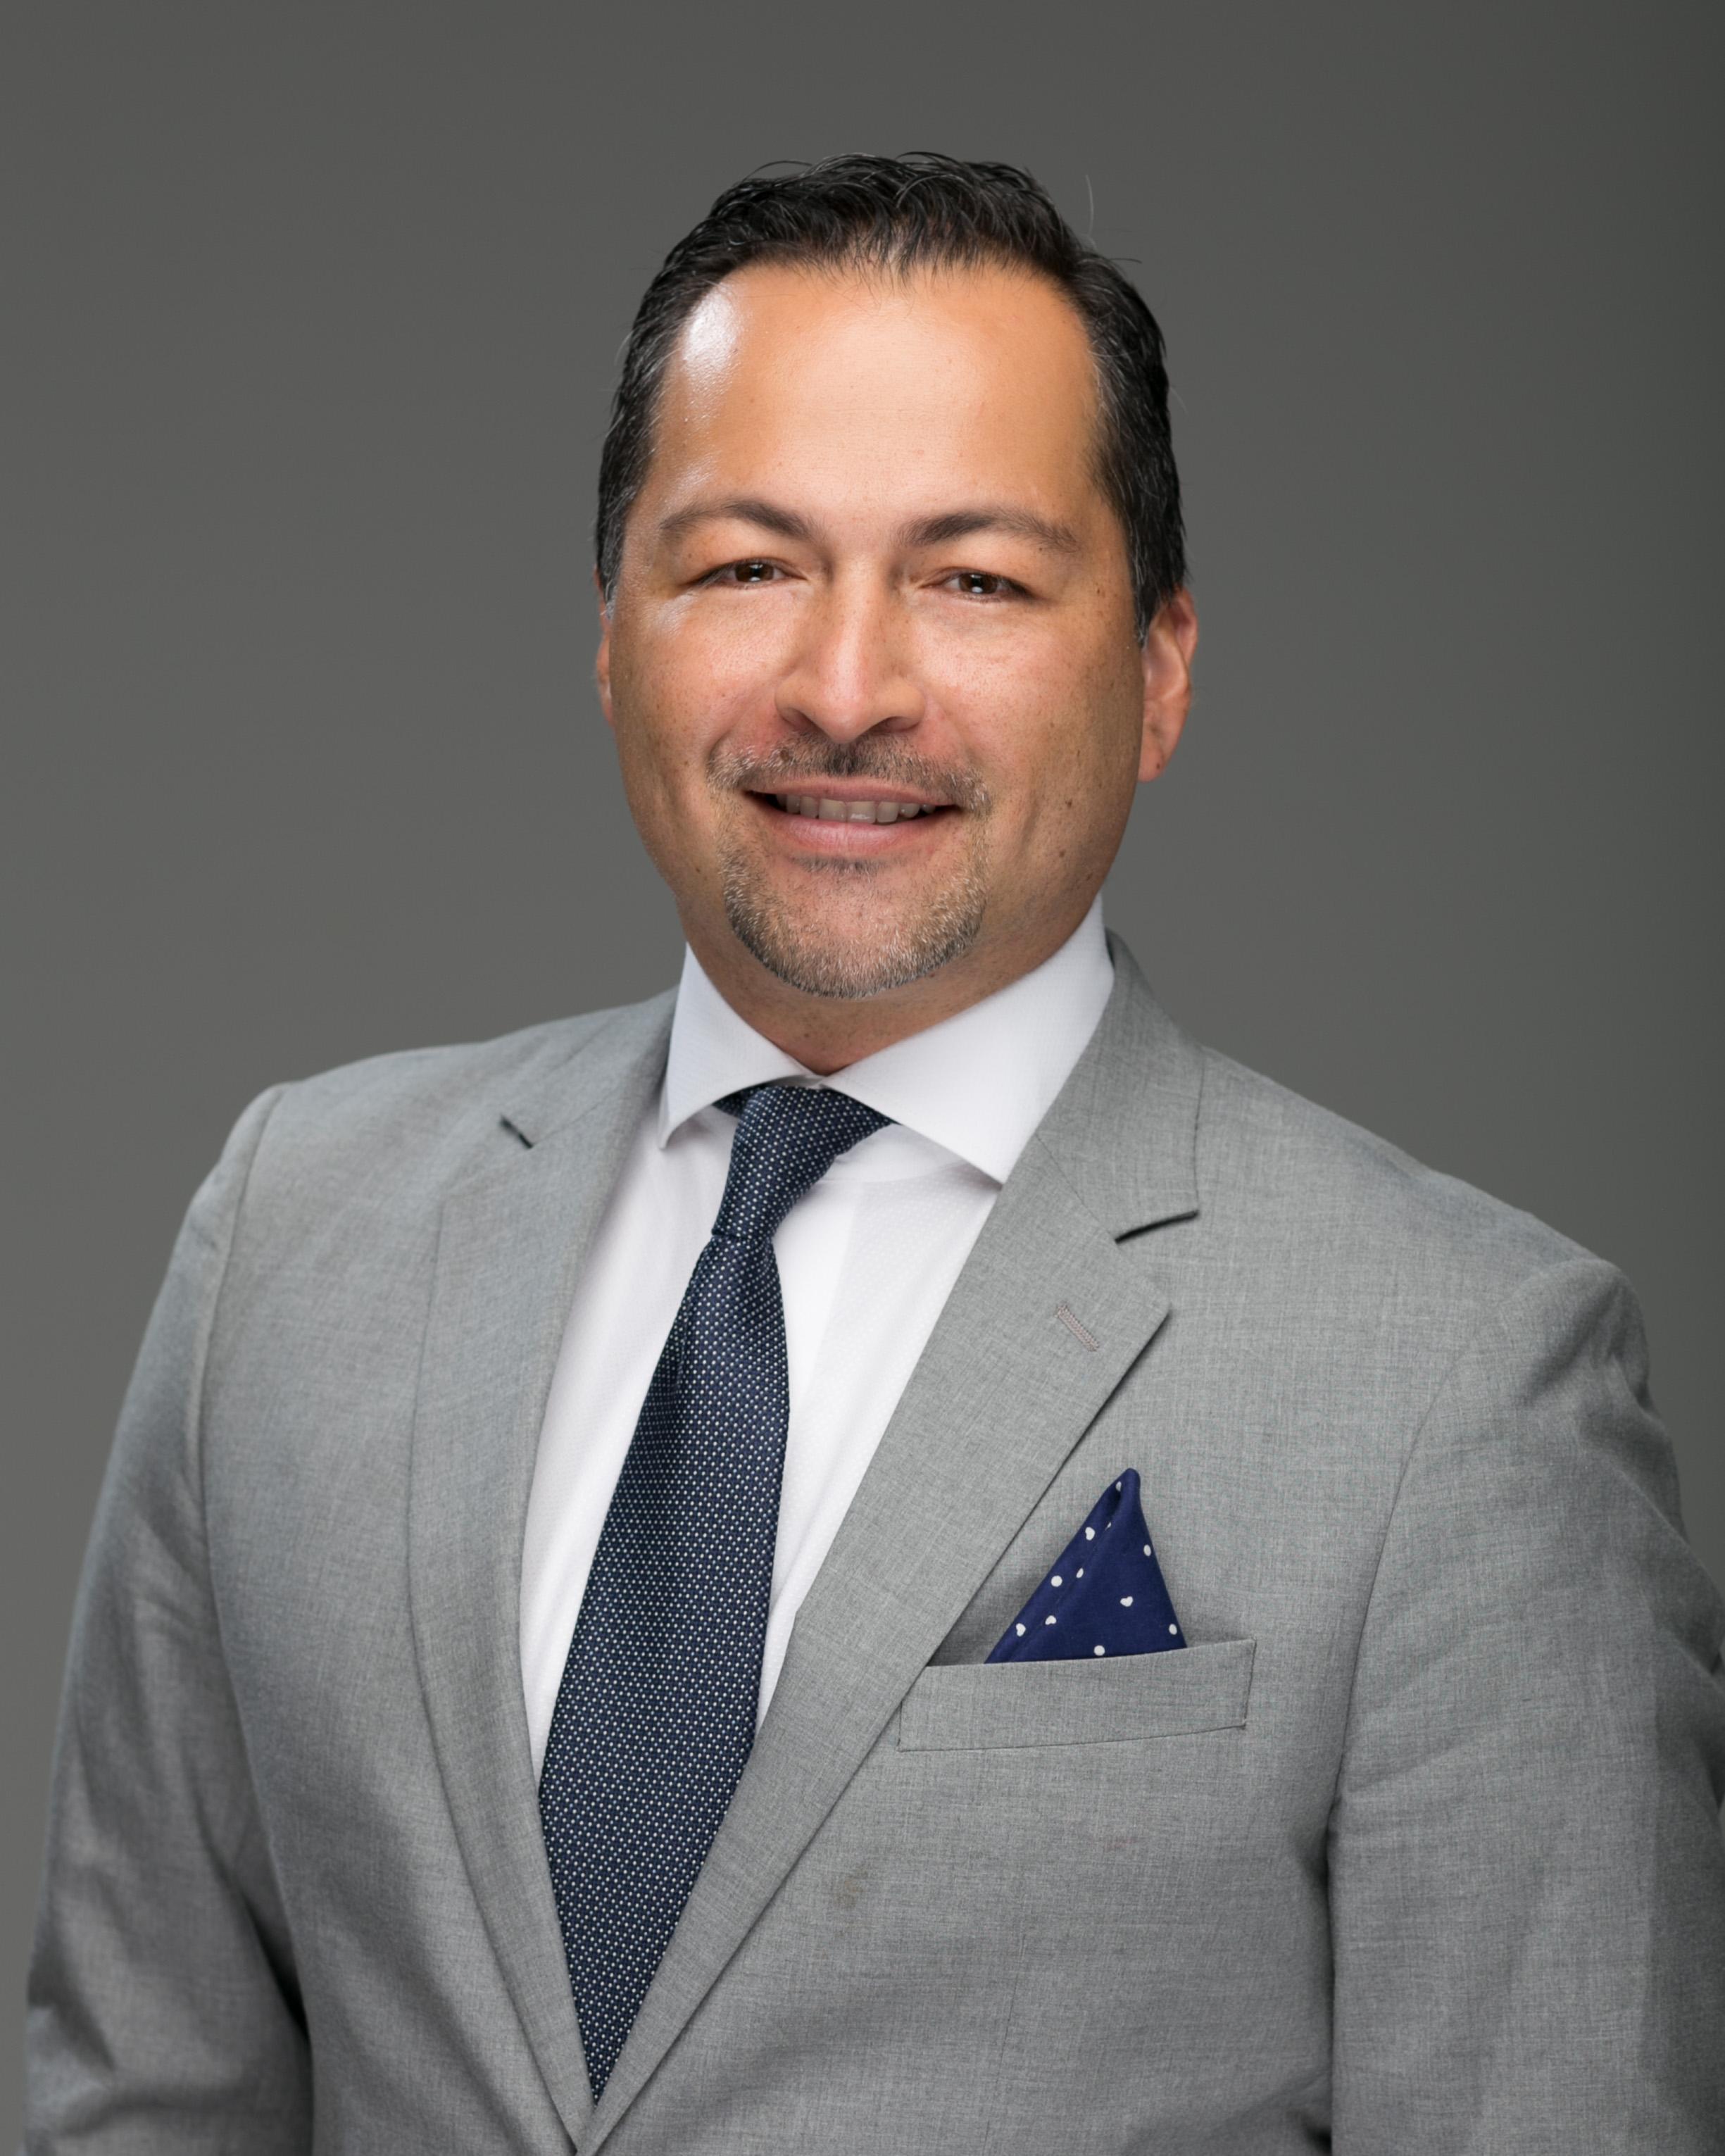 Jefferson Ovalle - Director of Operationsjefferson@genesiscoc.com